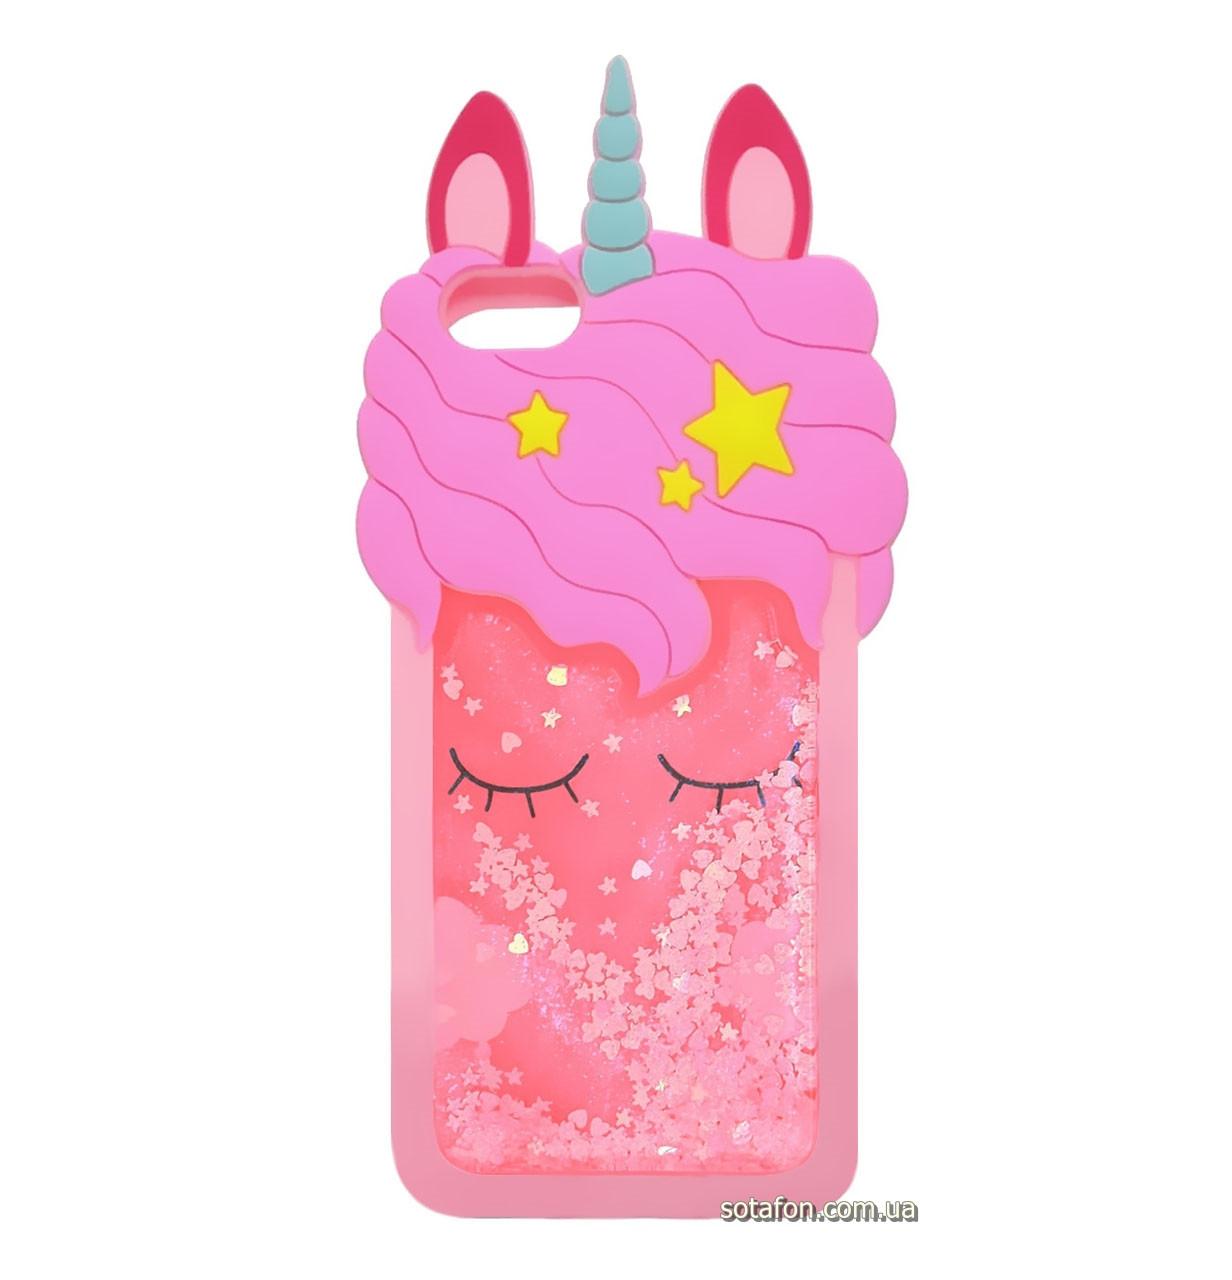 Чехол-накладка TPU 3D (Жидкий Блеск) Little Unicorn для IPhone 5 / 5s / SE Pink